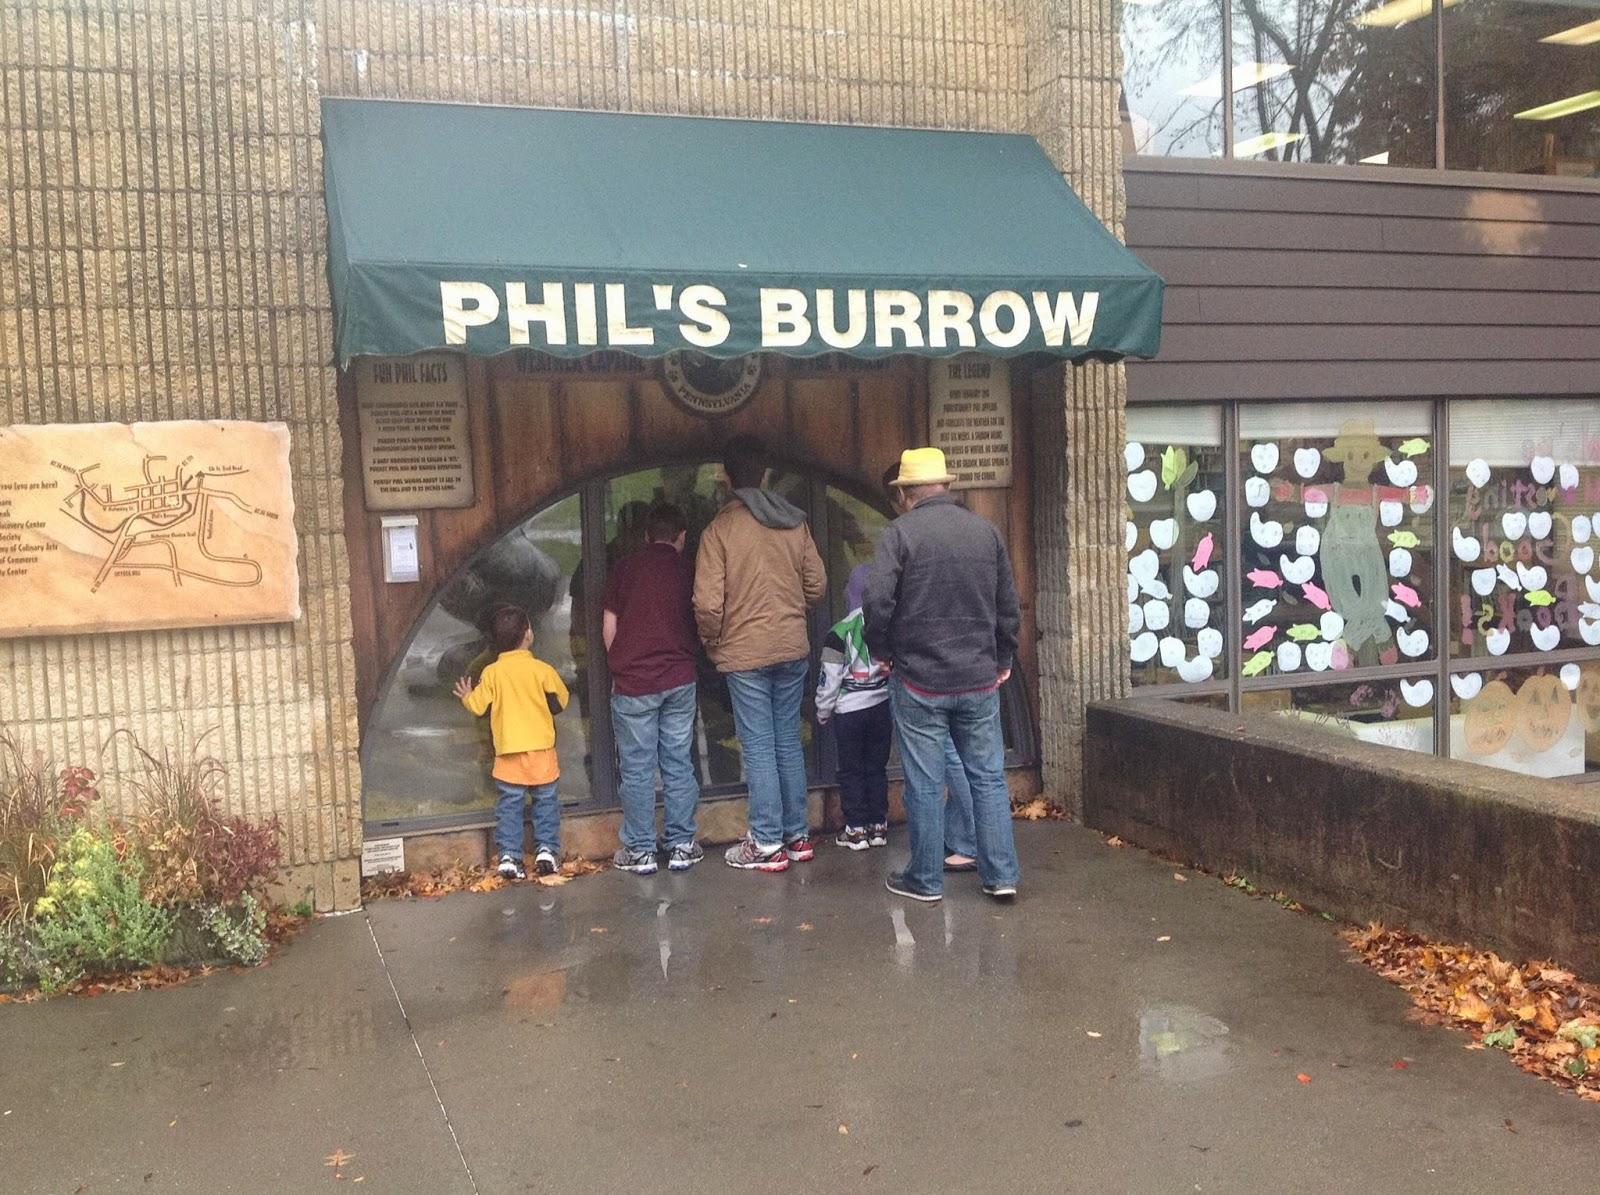 Punxsutawney Phil's Burrow